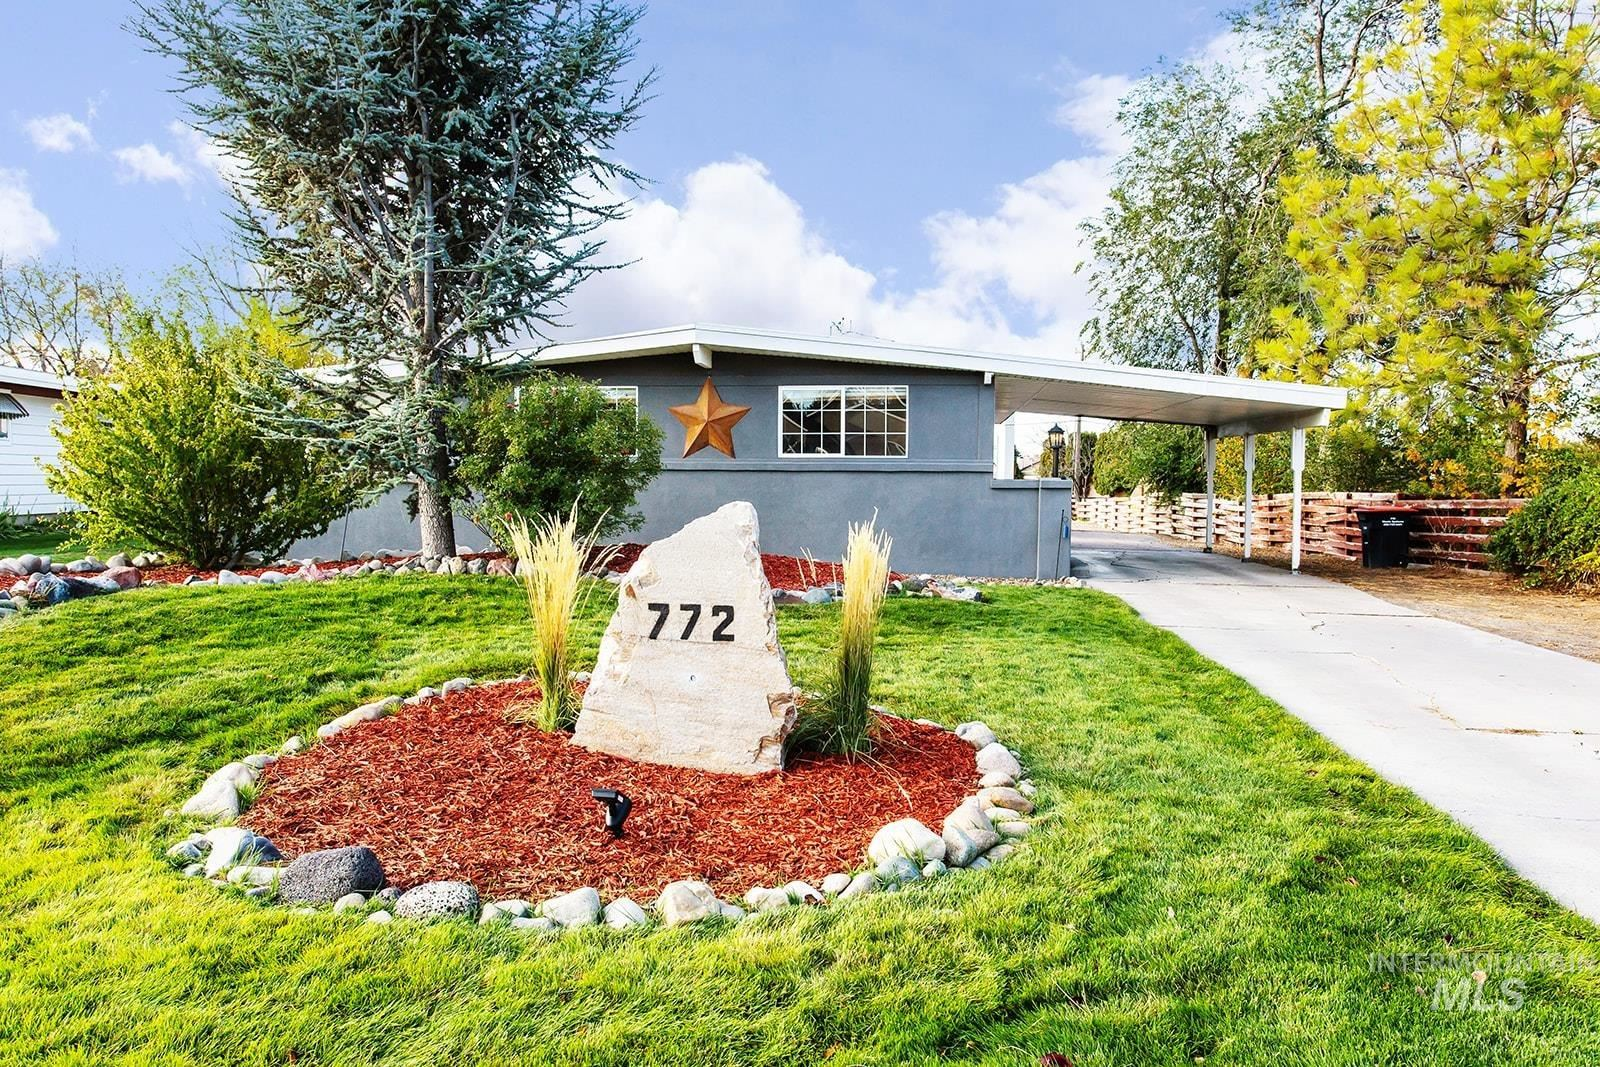 Photo of 772 Greenwood Drive, Twin Falls, ID 83301 (MLS # 98822444)